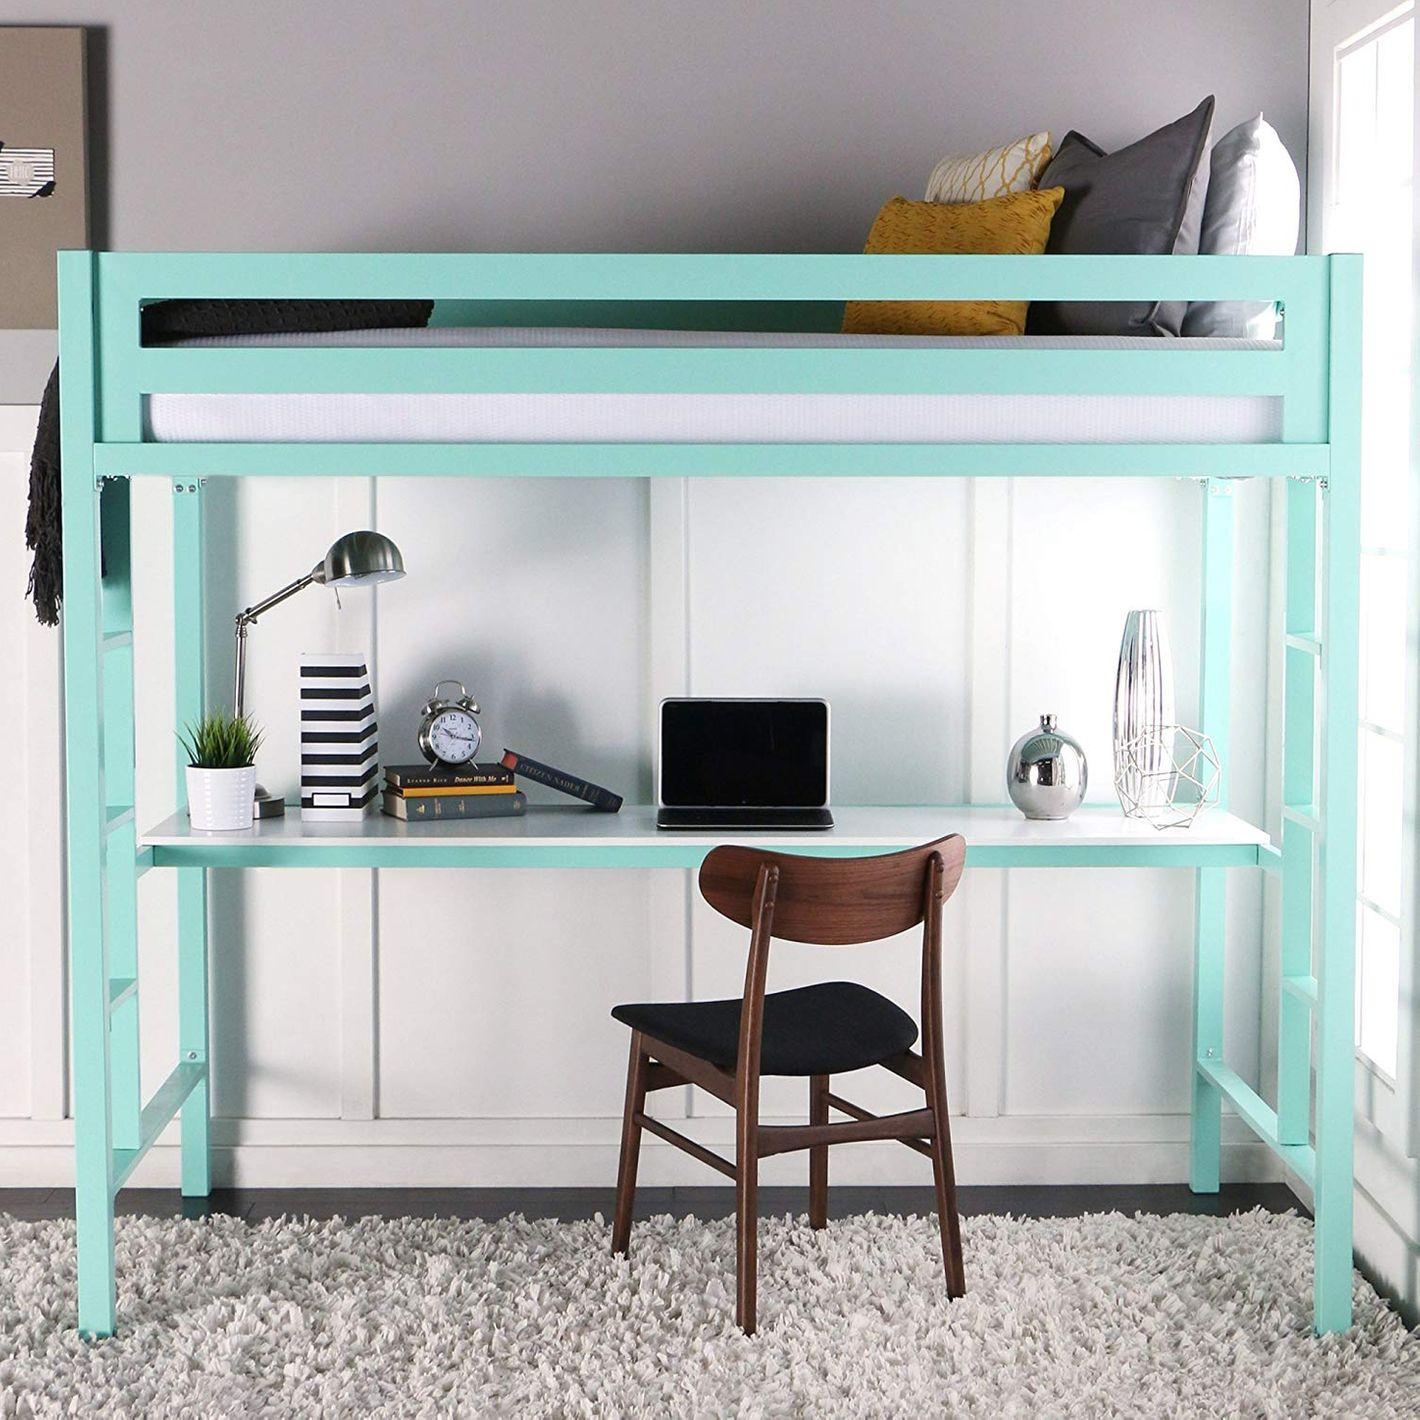 WE Furniture Premium Twin Metal Loft Bed With Workstation